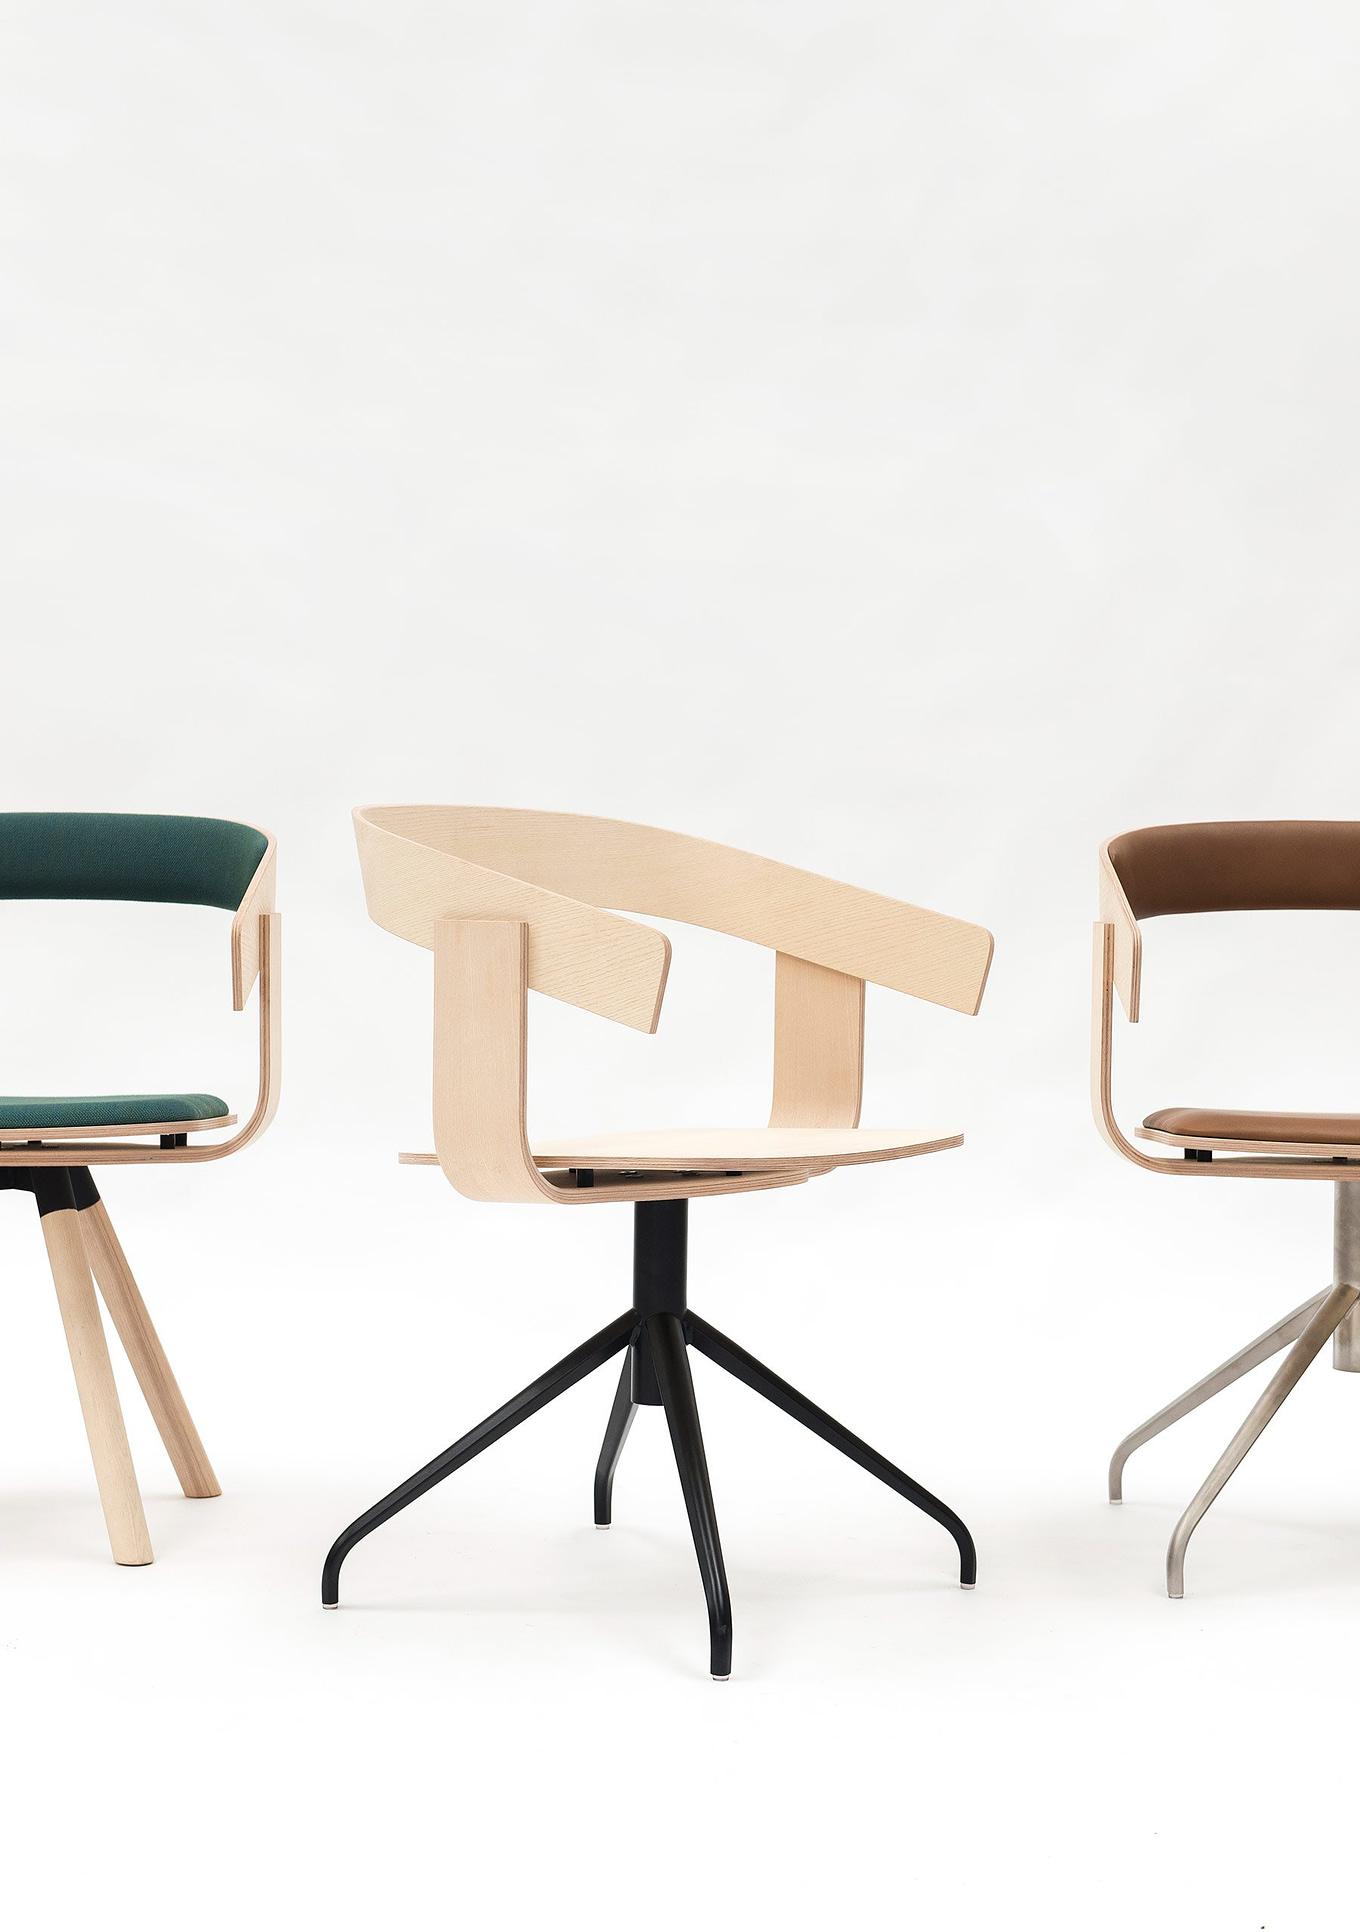 buzzifloat-chair-alain-gilles-gessato-1